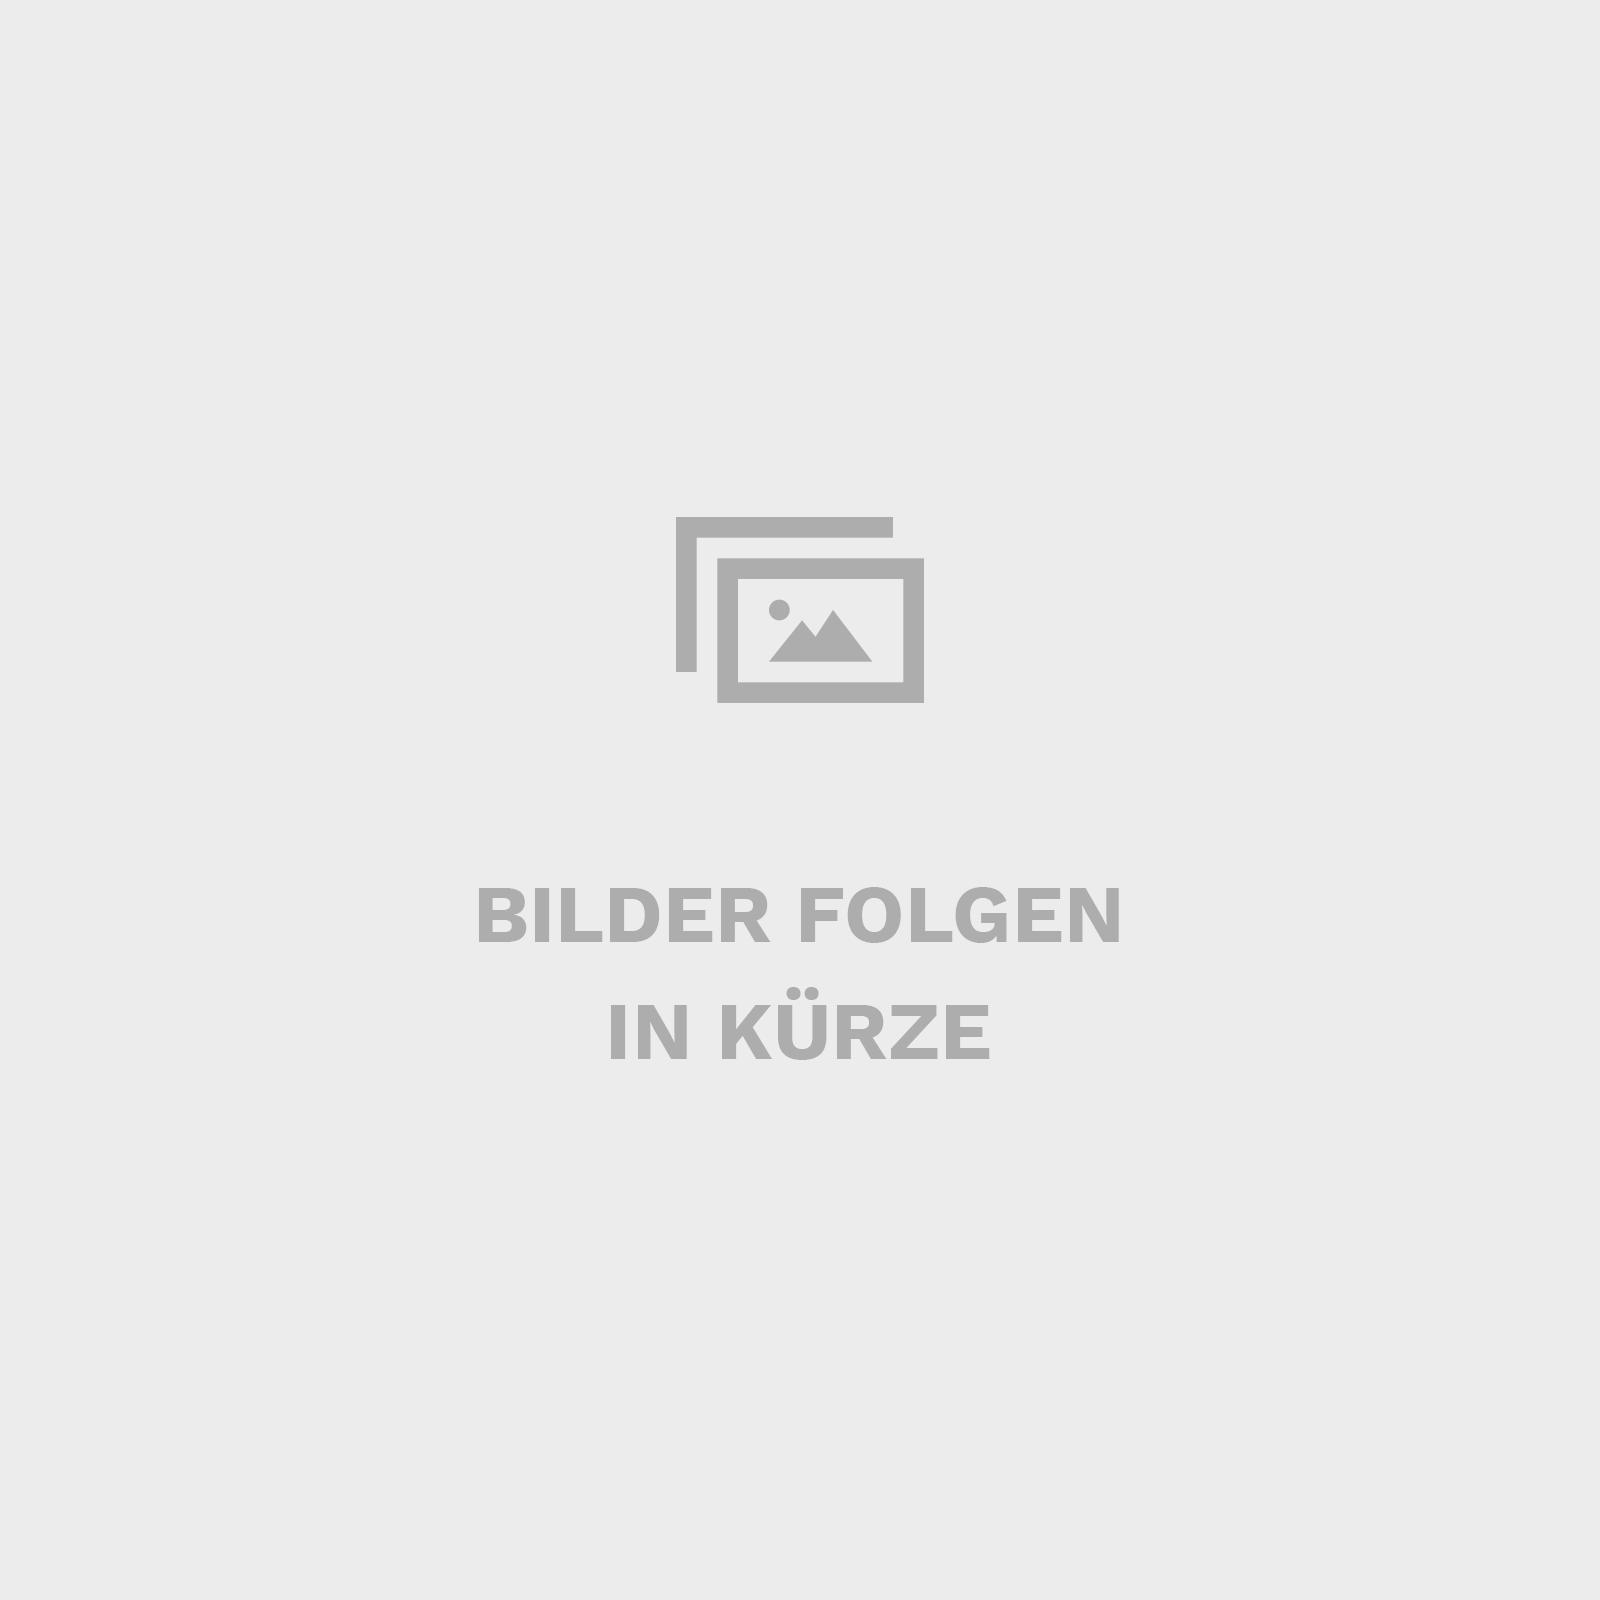 Kvadrat Rugs - Duotone - Farbe 0721 - Detailansicht